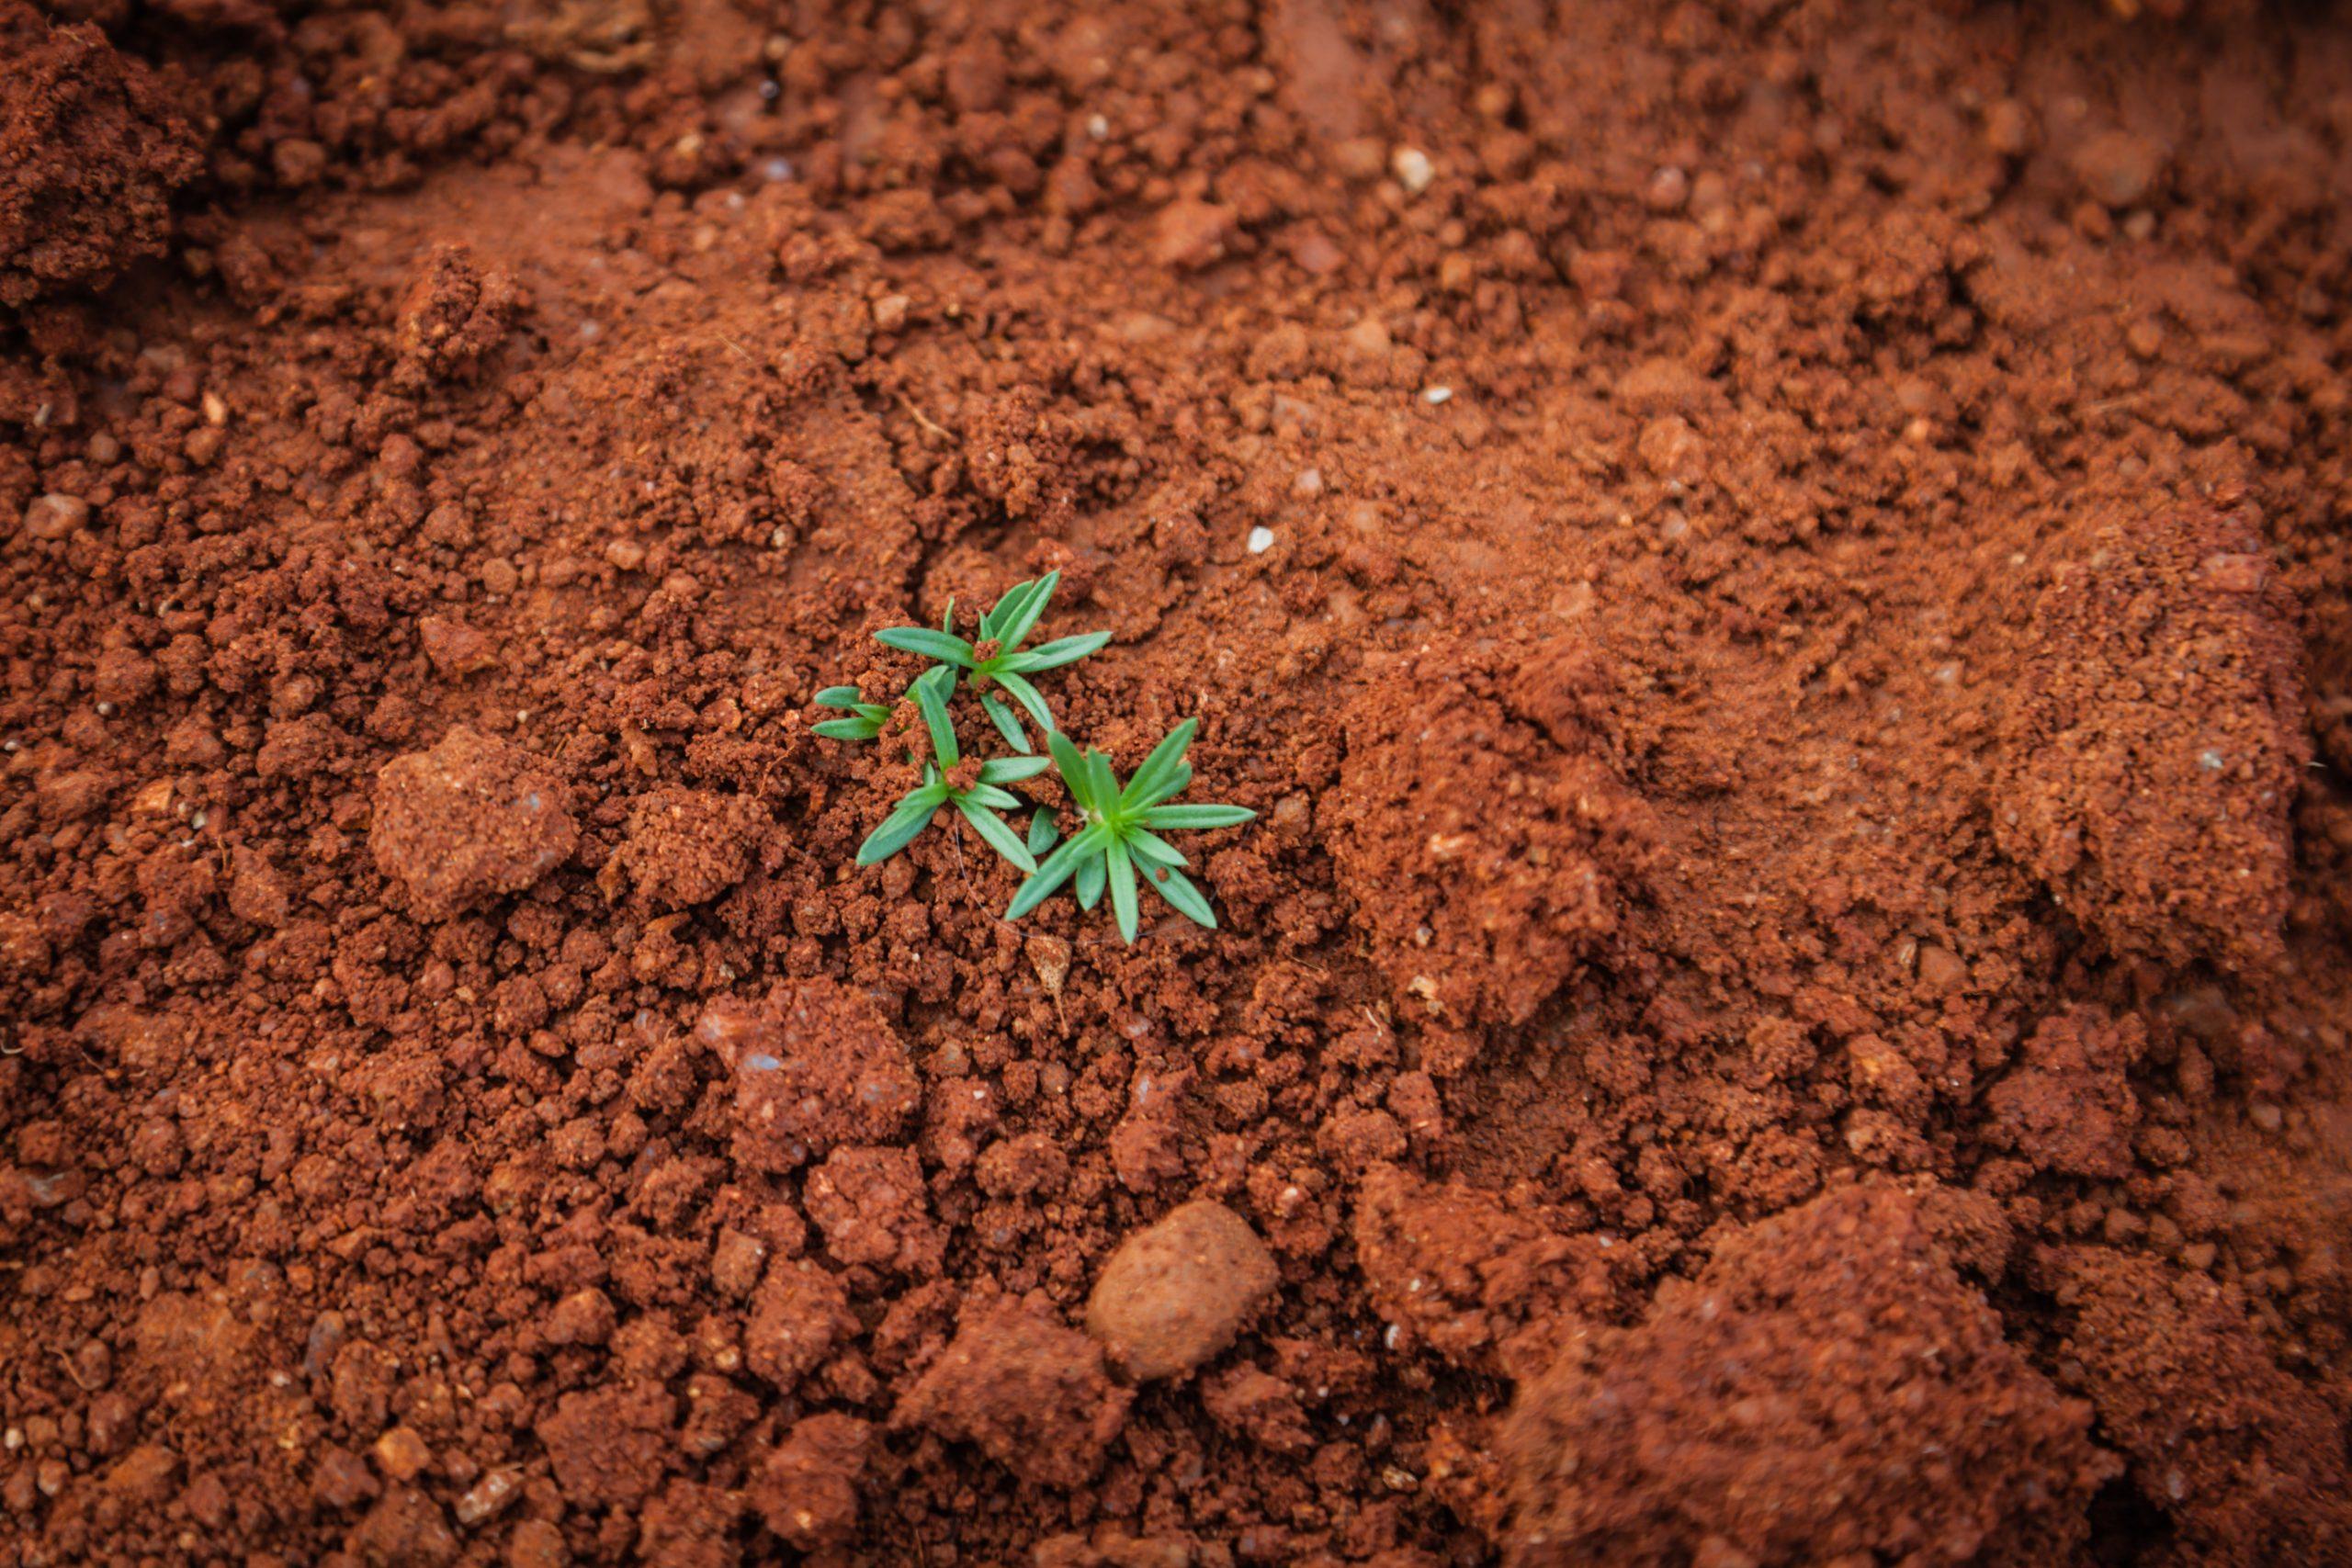 A seedling growing in reddish dirt